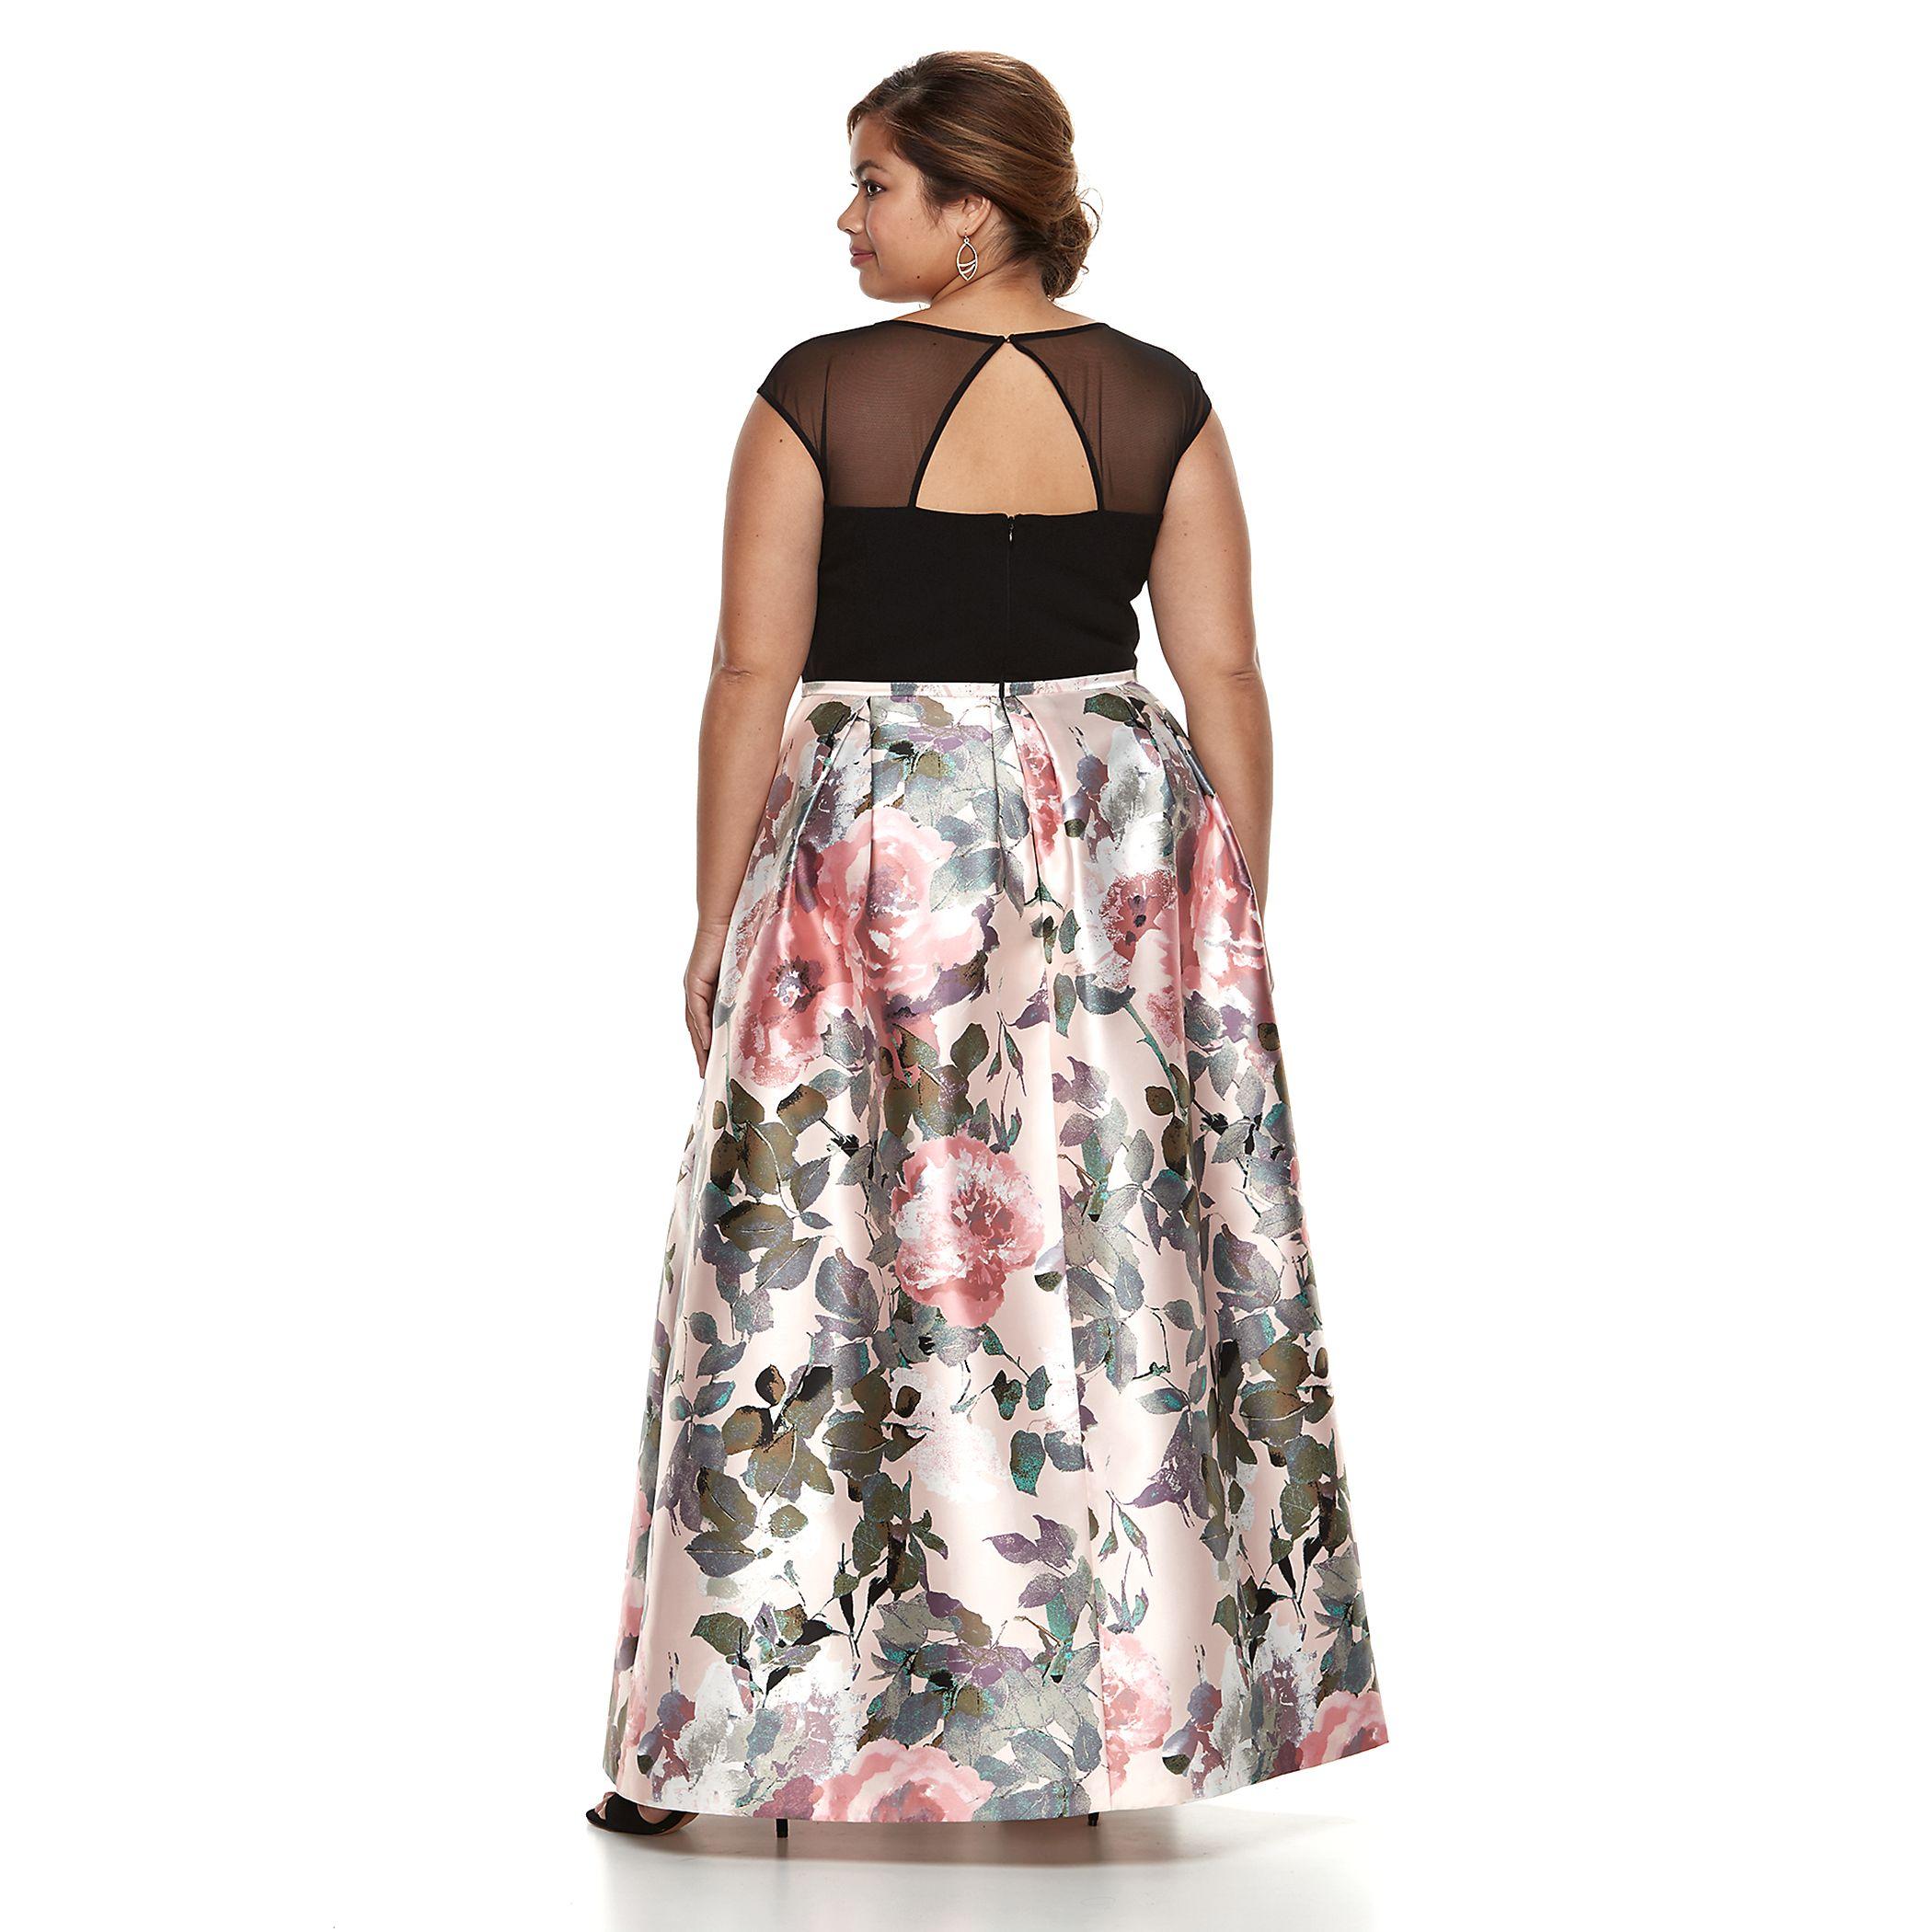 9364868f566 Homecoming Dresses 2018 Kohls - Gomes Weine AG